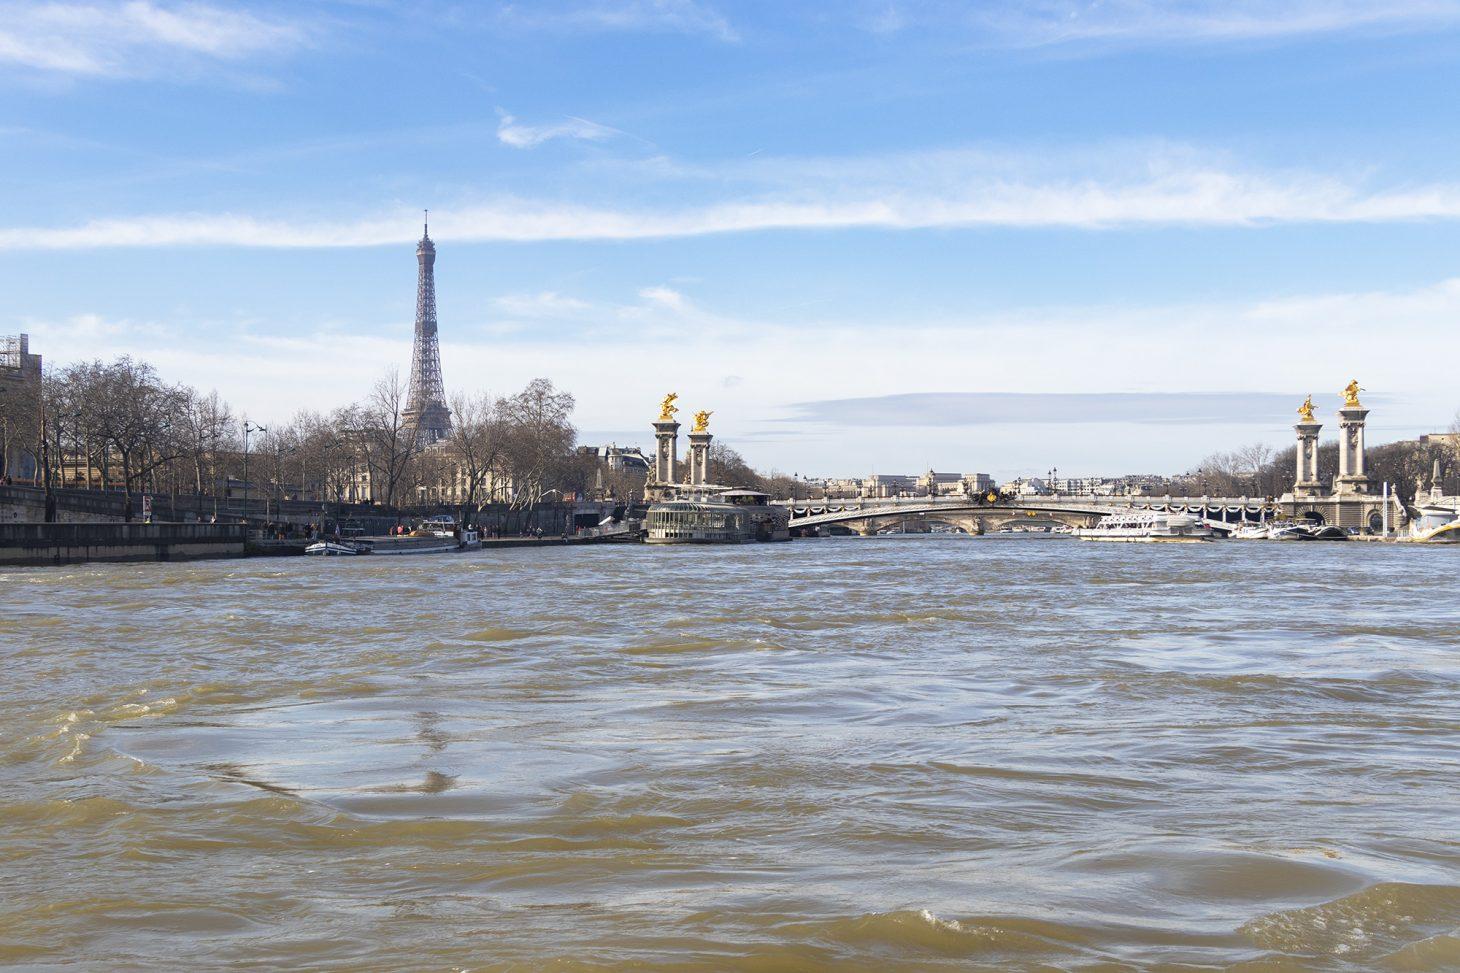 Seine River Cruise with Eiffel Tower, Paris